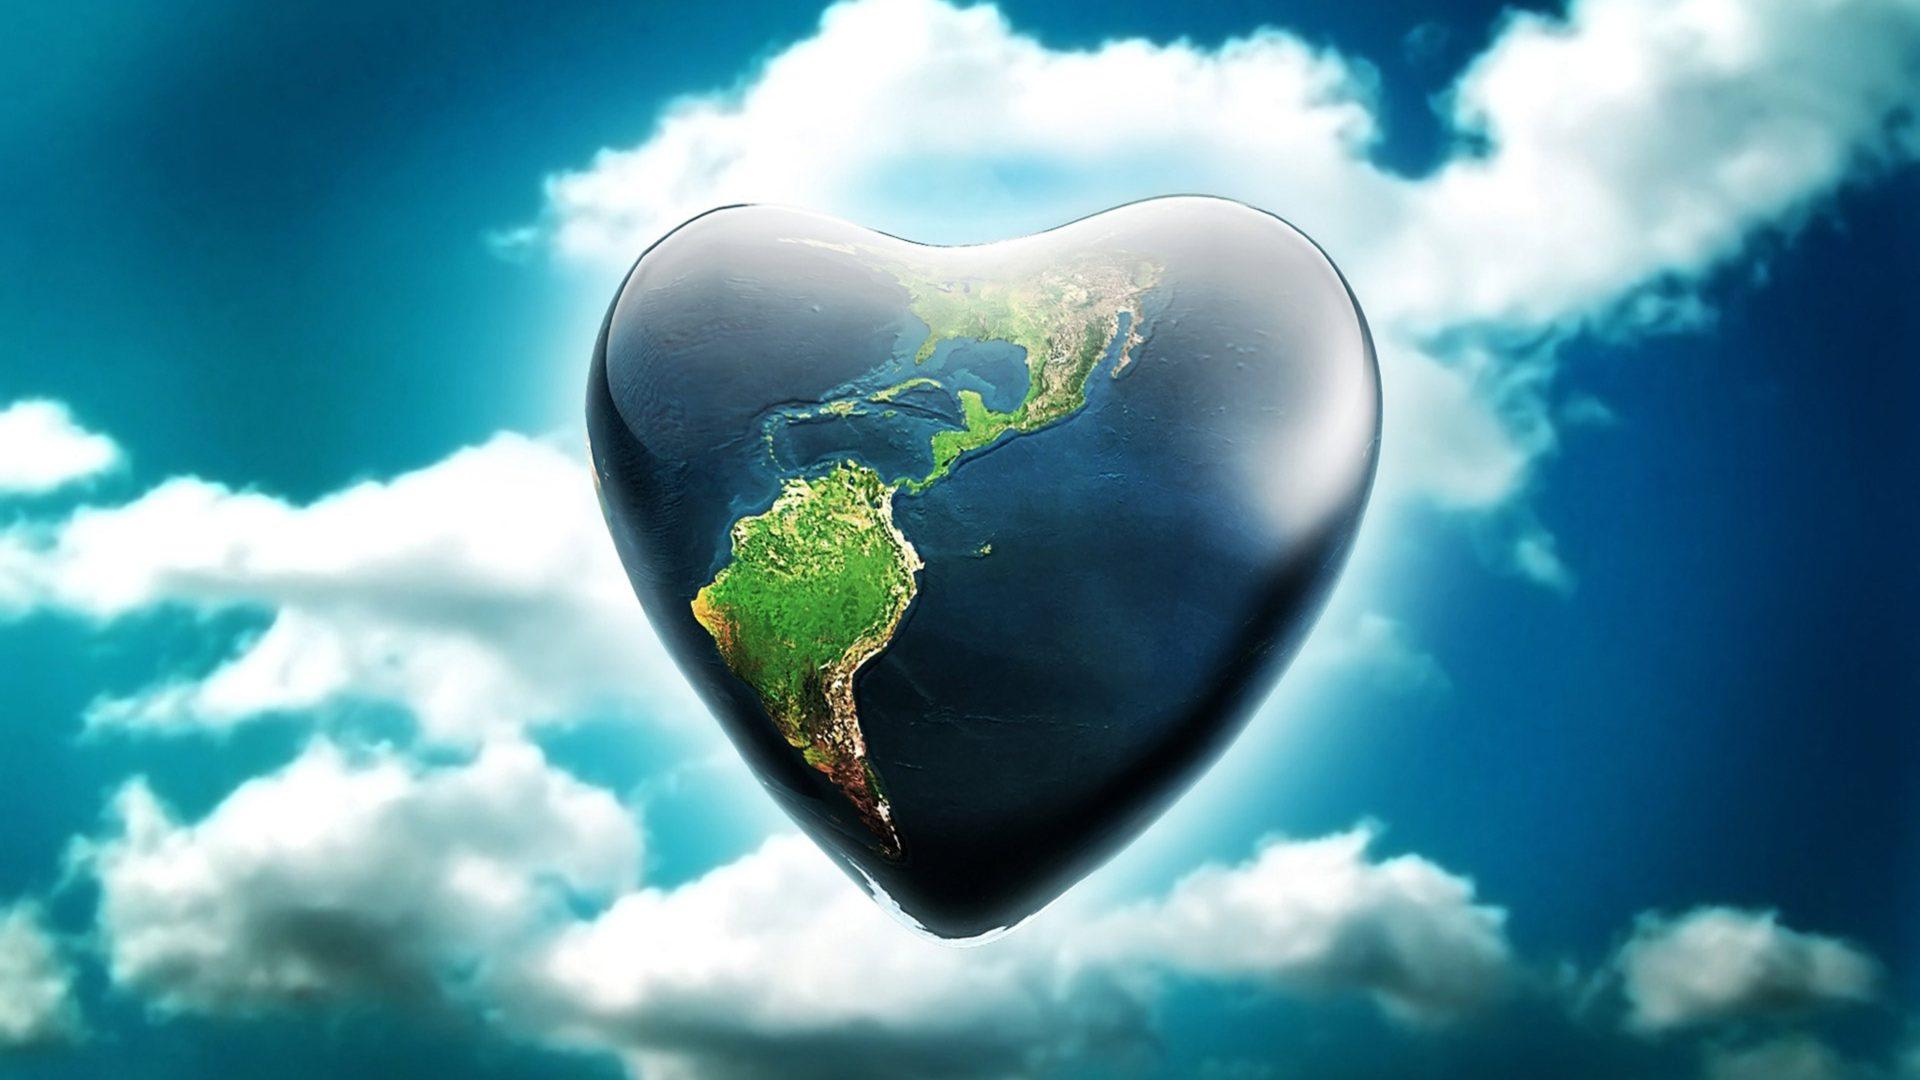 Ipad Air 2 Cute Wallpaper Heart Shaped Earth Artistic Wallpaper 12560x1600